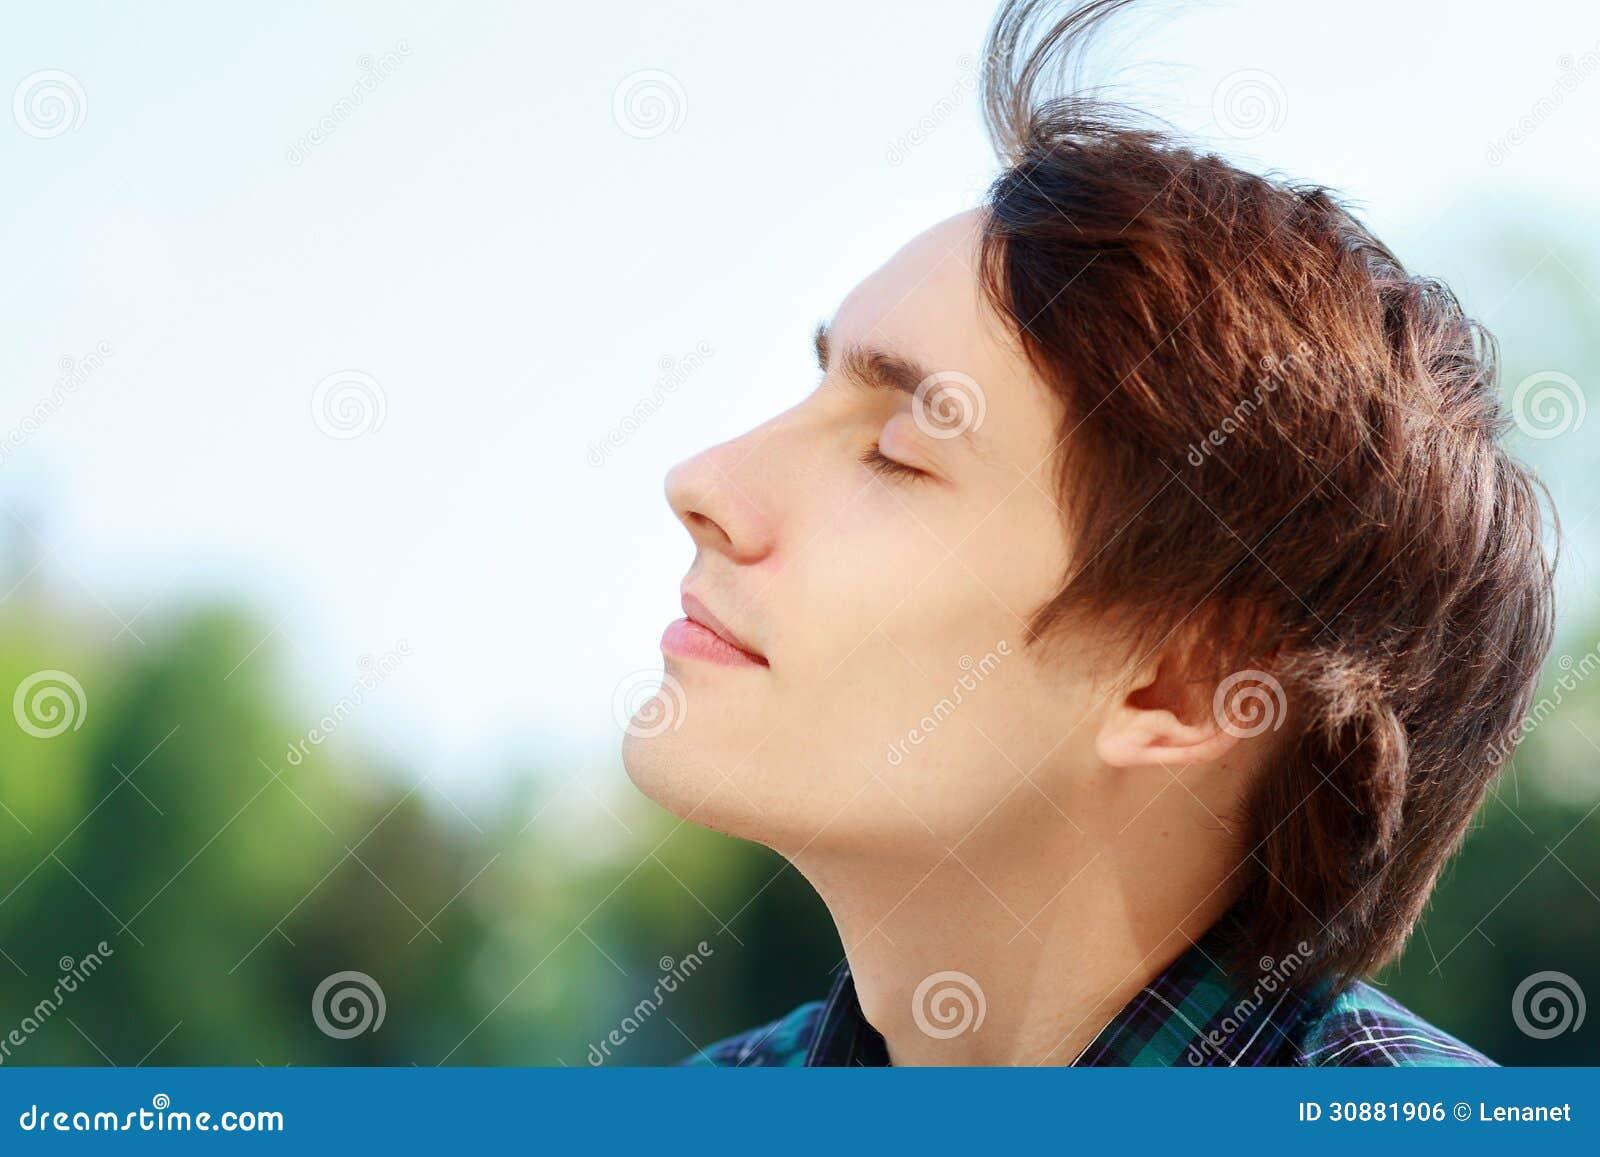 Man Breathing Fresh Air Royalty Free Stock Image Image